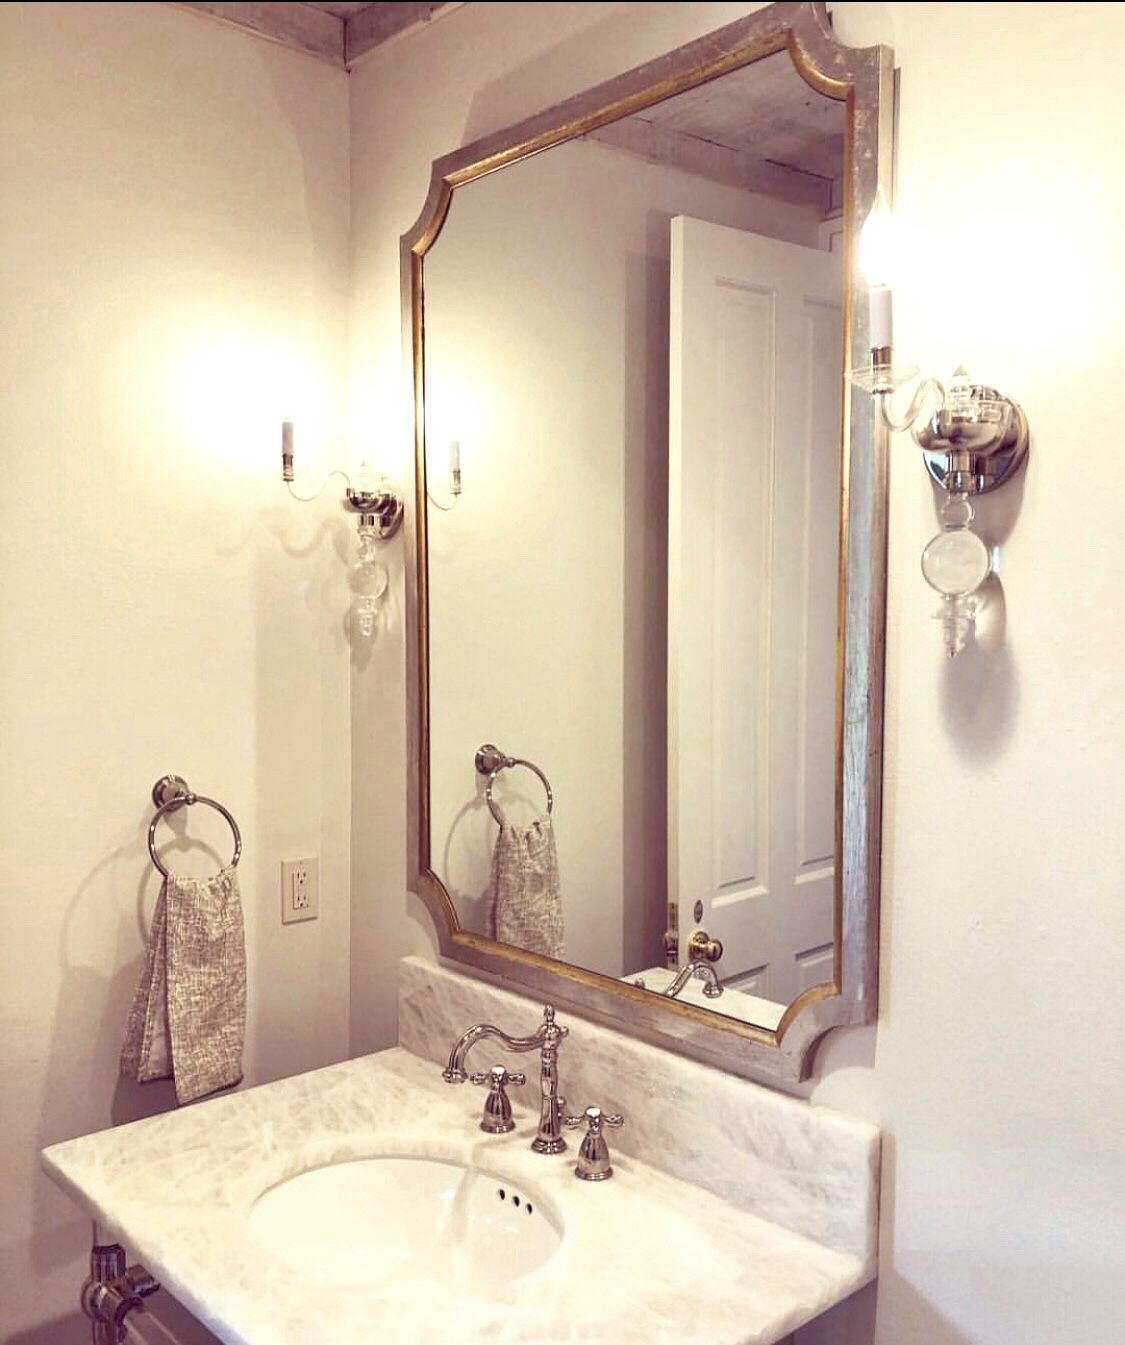 Tulip Silver And Gold Wall Mirror Decorative Bathroom Mirrors Gold Mirror Wall Small Bathroom Decor